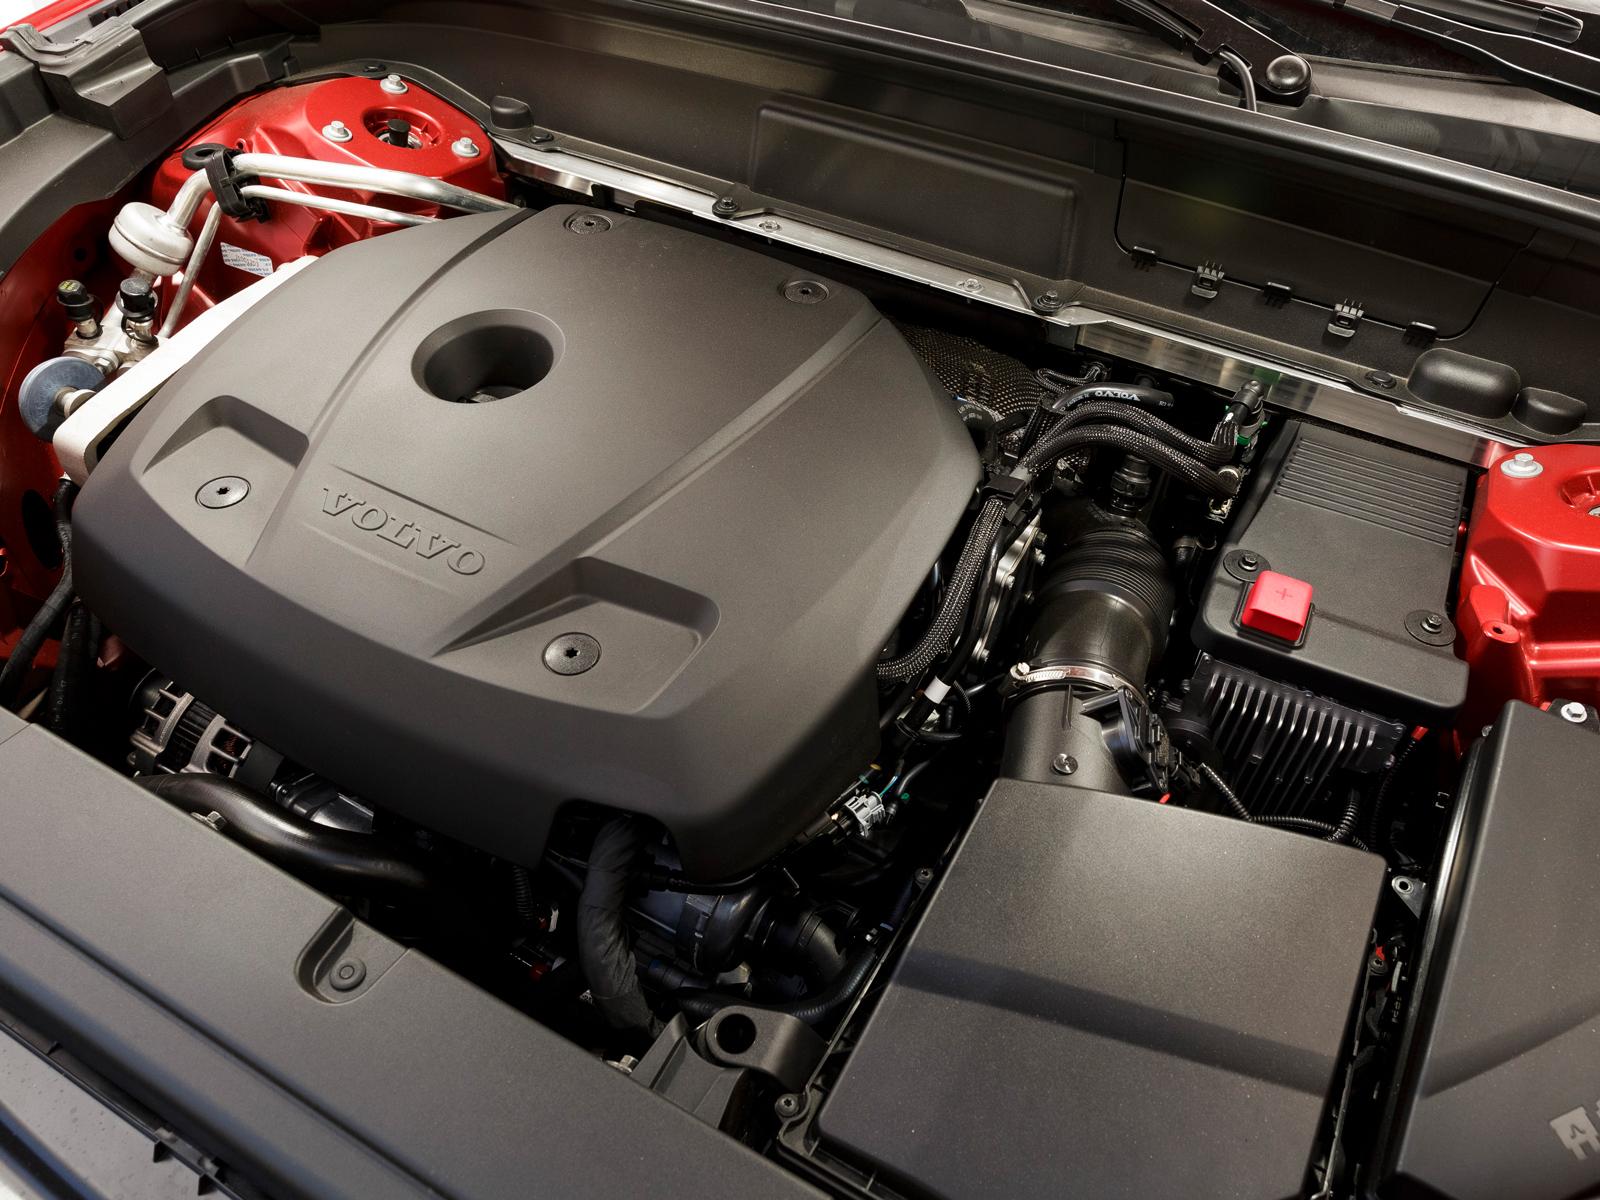 O motor 2.0 de 254 cv fez 7,9 km/l na cidade e 11,1 km/l na estrada